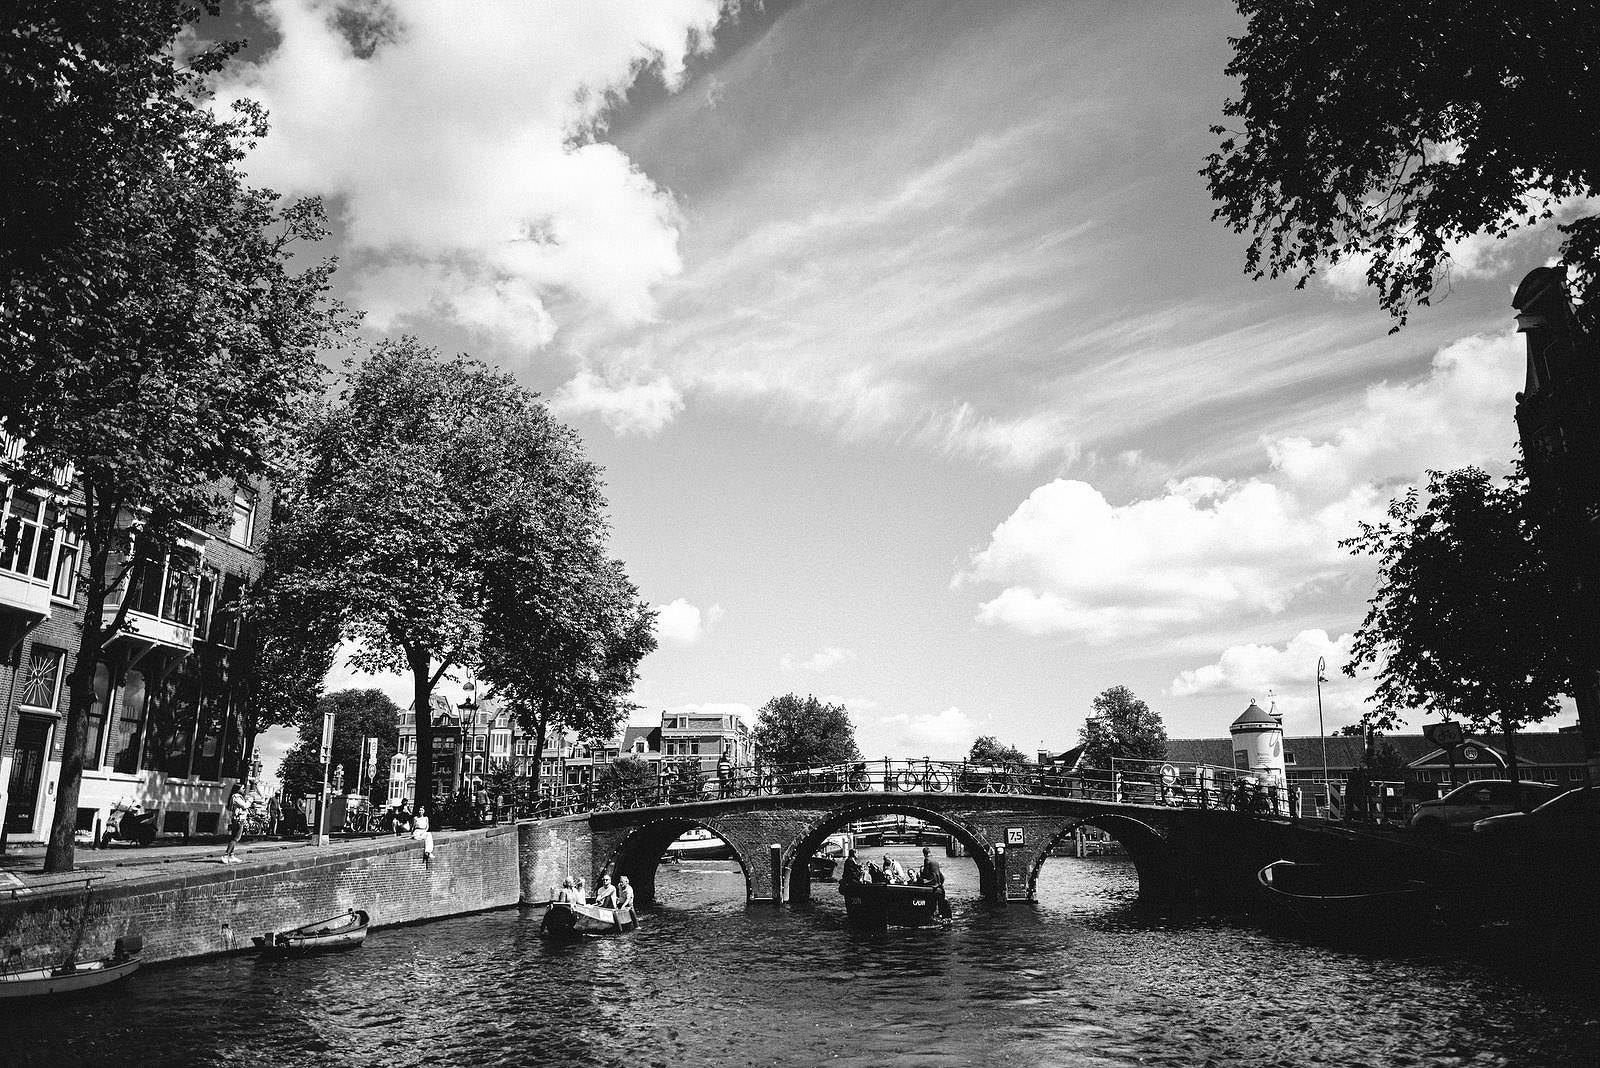 Fotograf Konstanz - Destination Wedding Photographer Amsterdam 057 - Destination Wedding Amsterdam  - 162 -